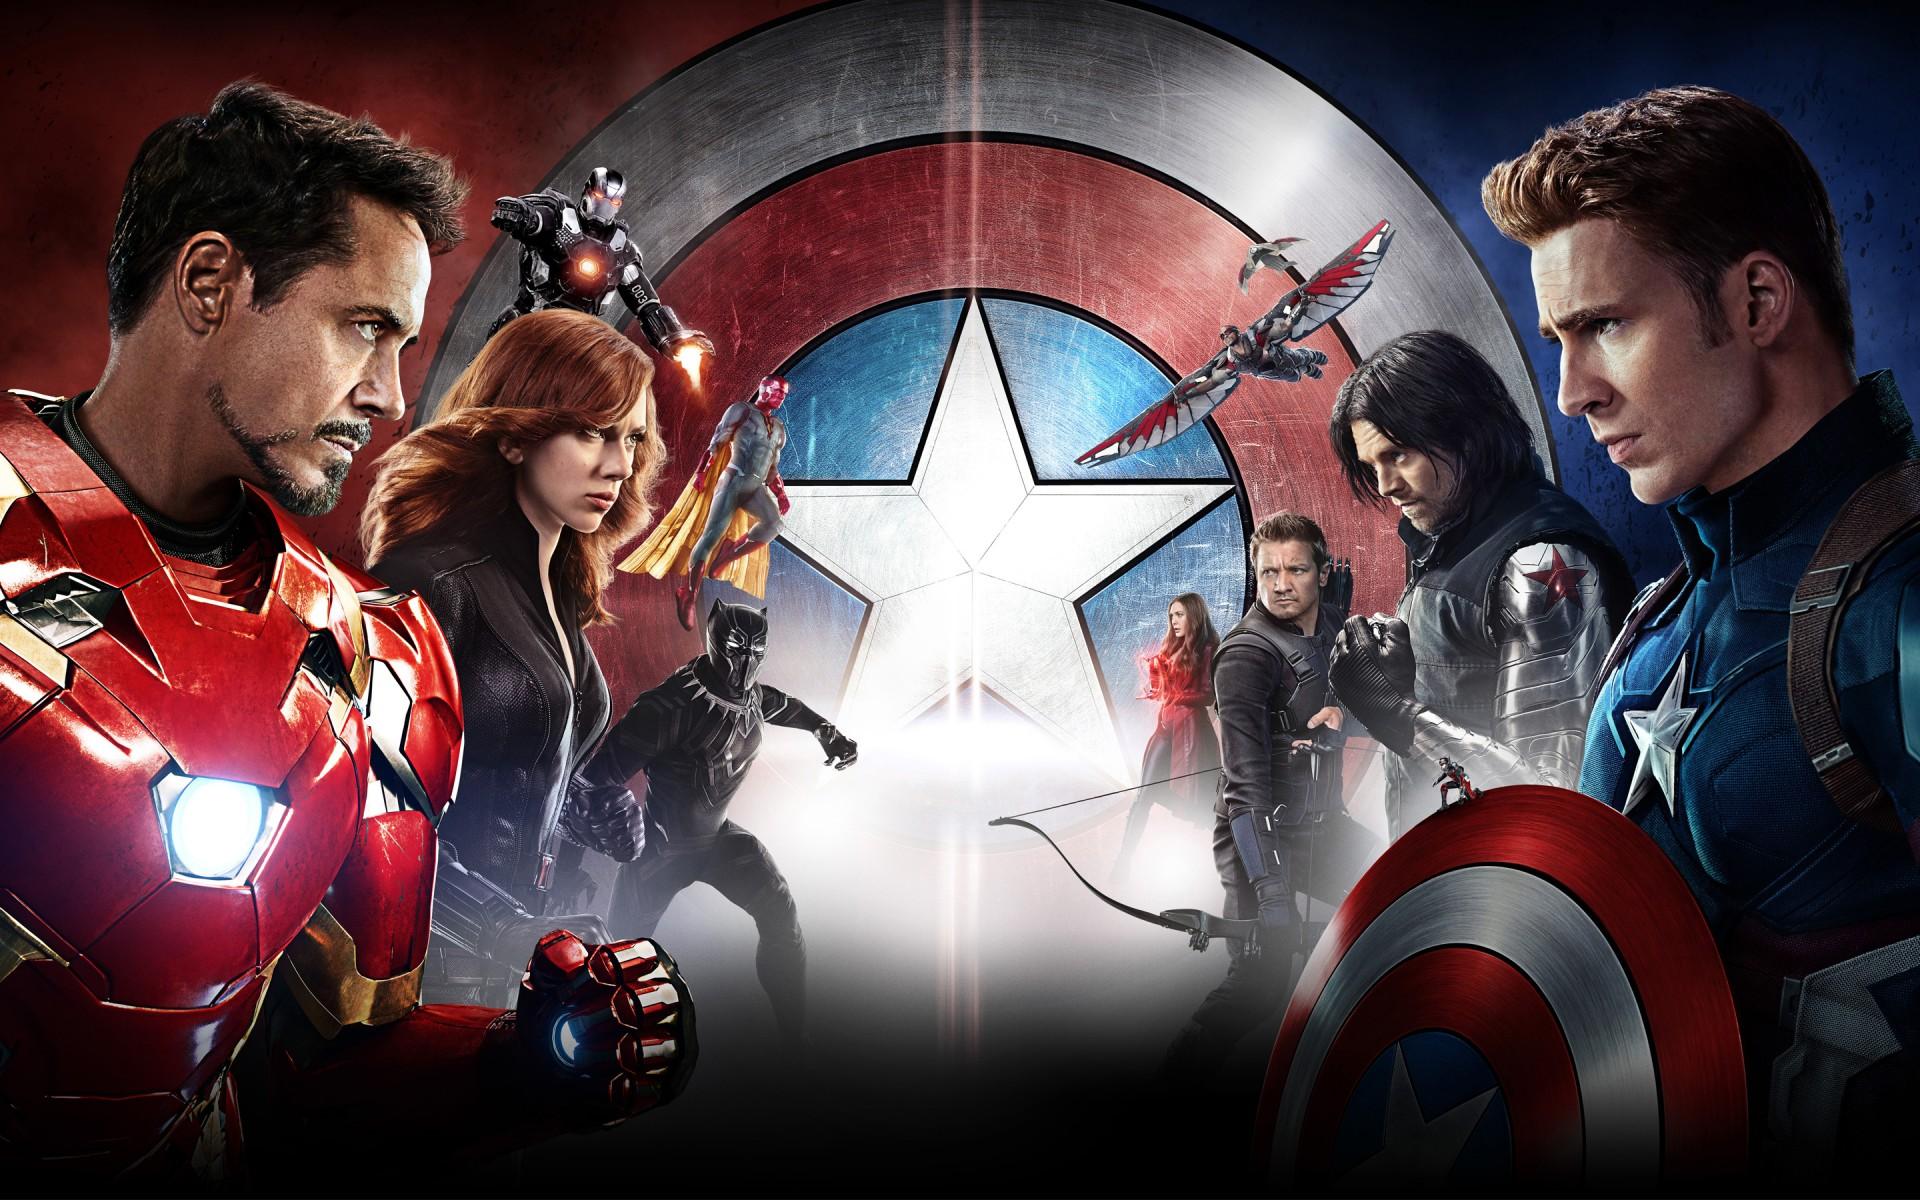 Deepika Padukone Hd Wallpapers For Iphone Captain America Civil War 5k Hd Wallpapers Hd Wallpapers